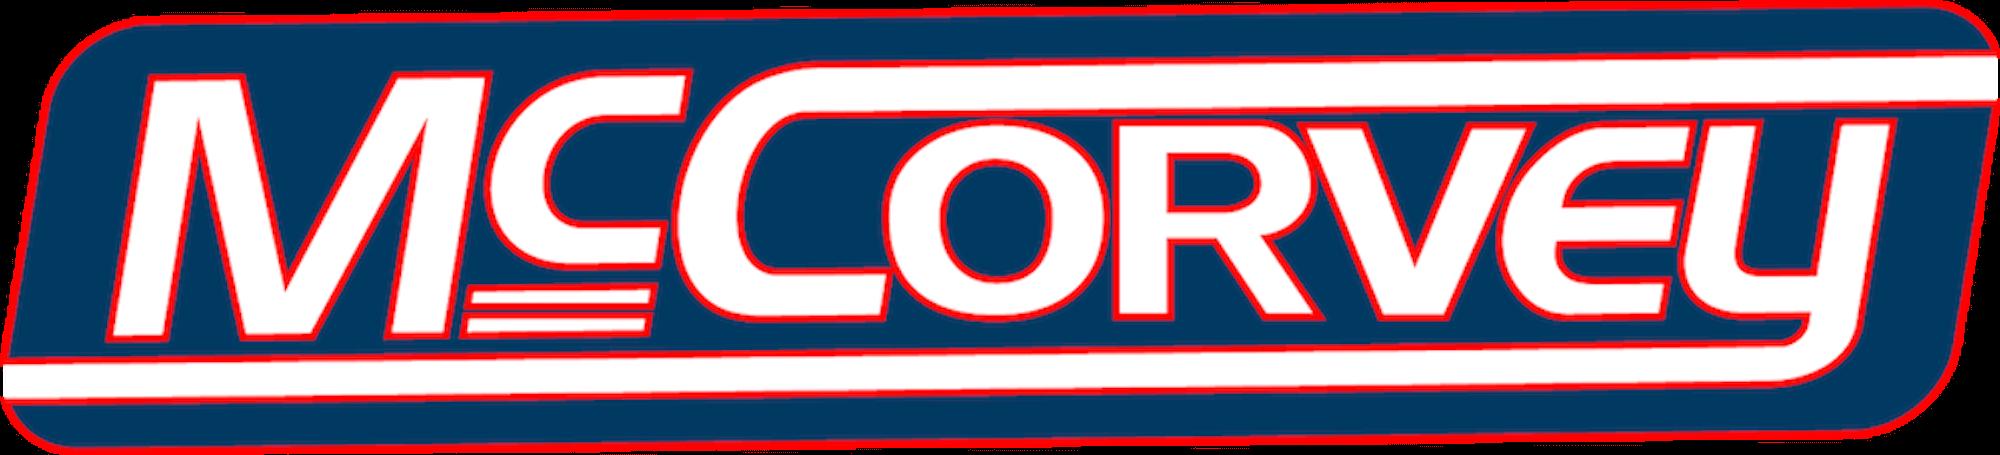 Mccorvey logo